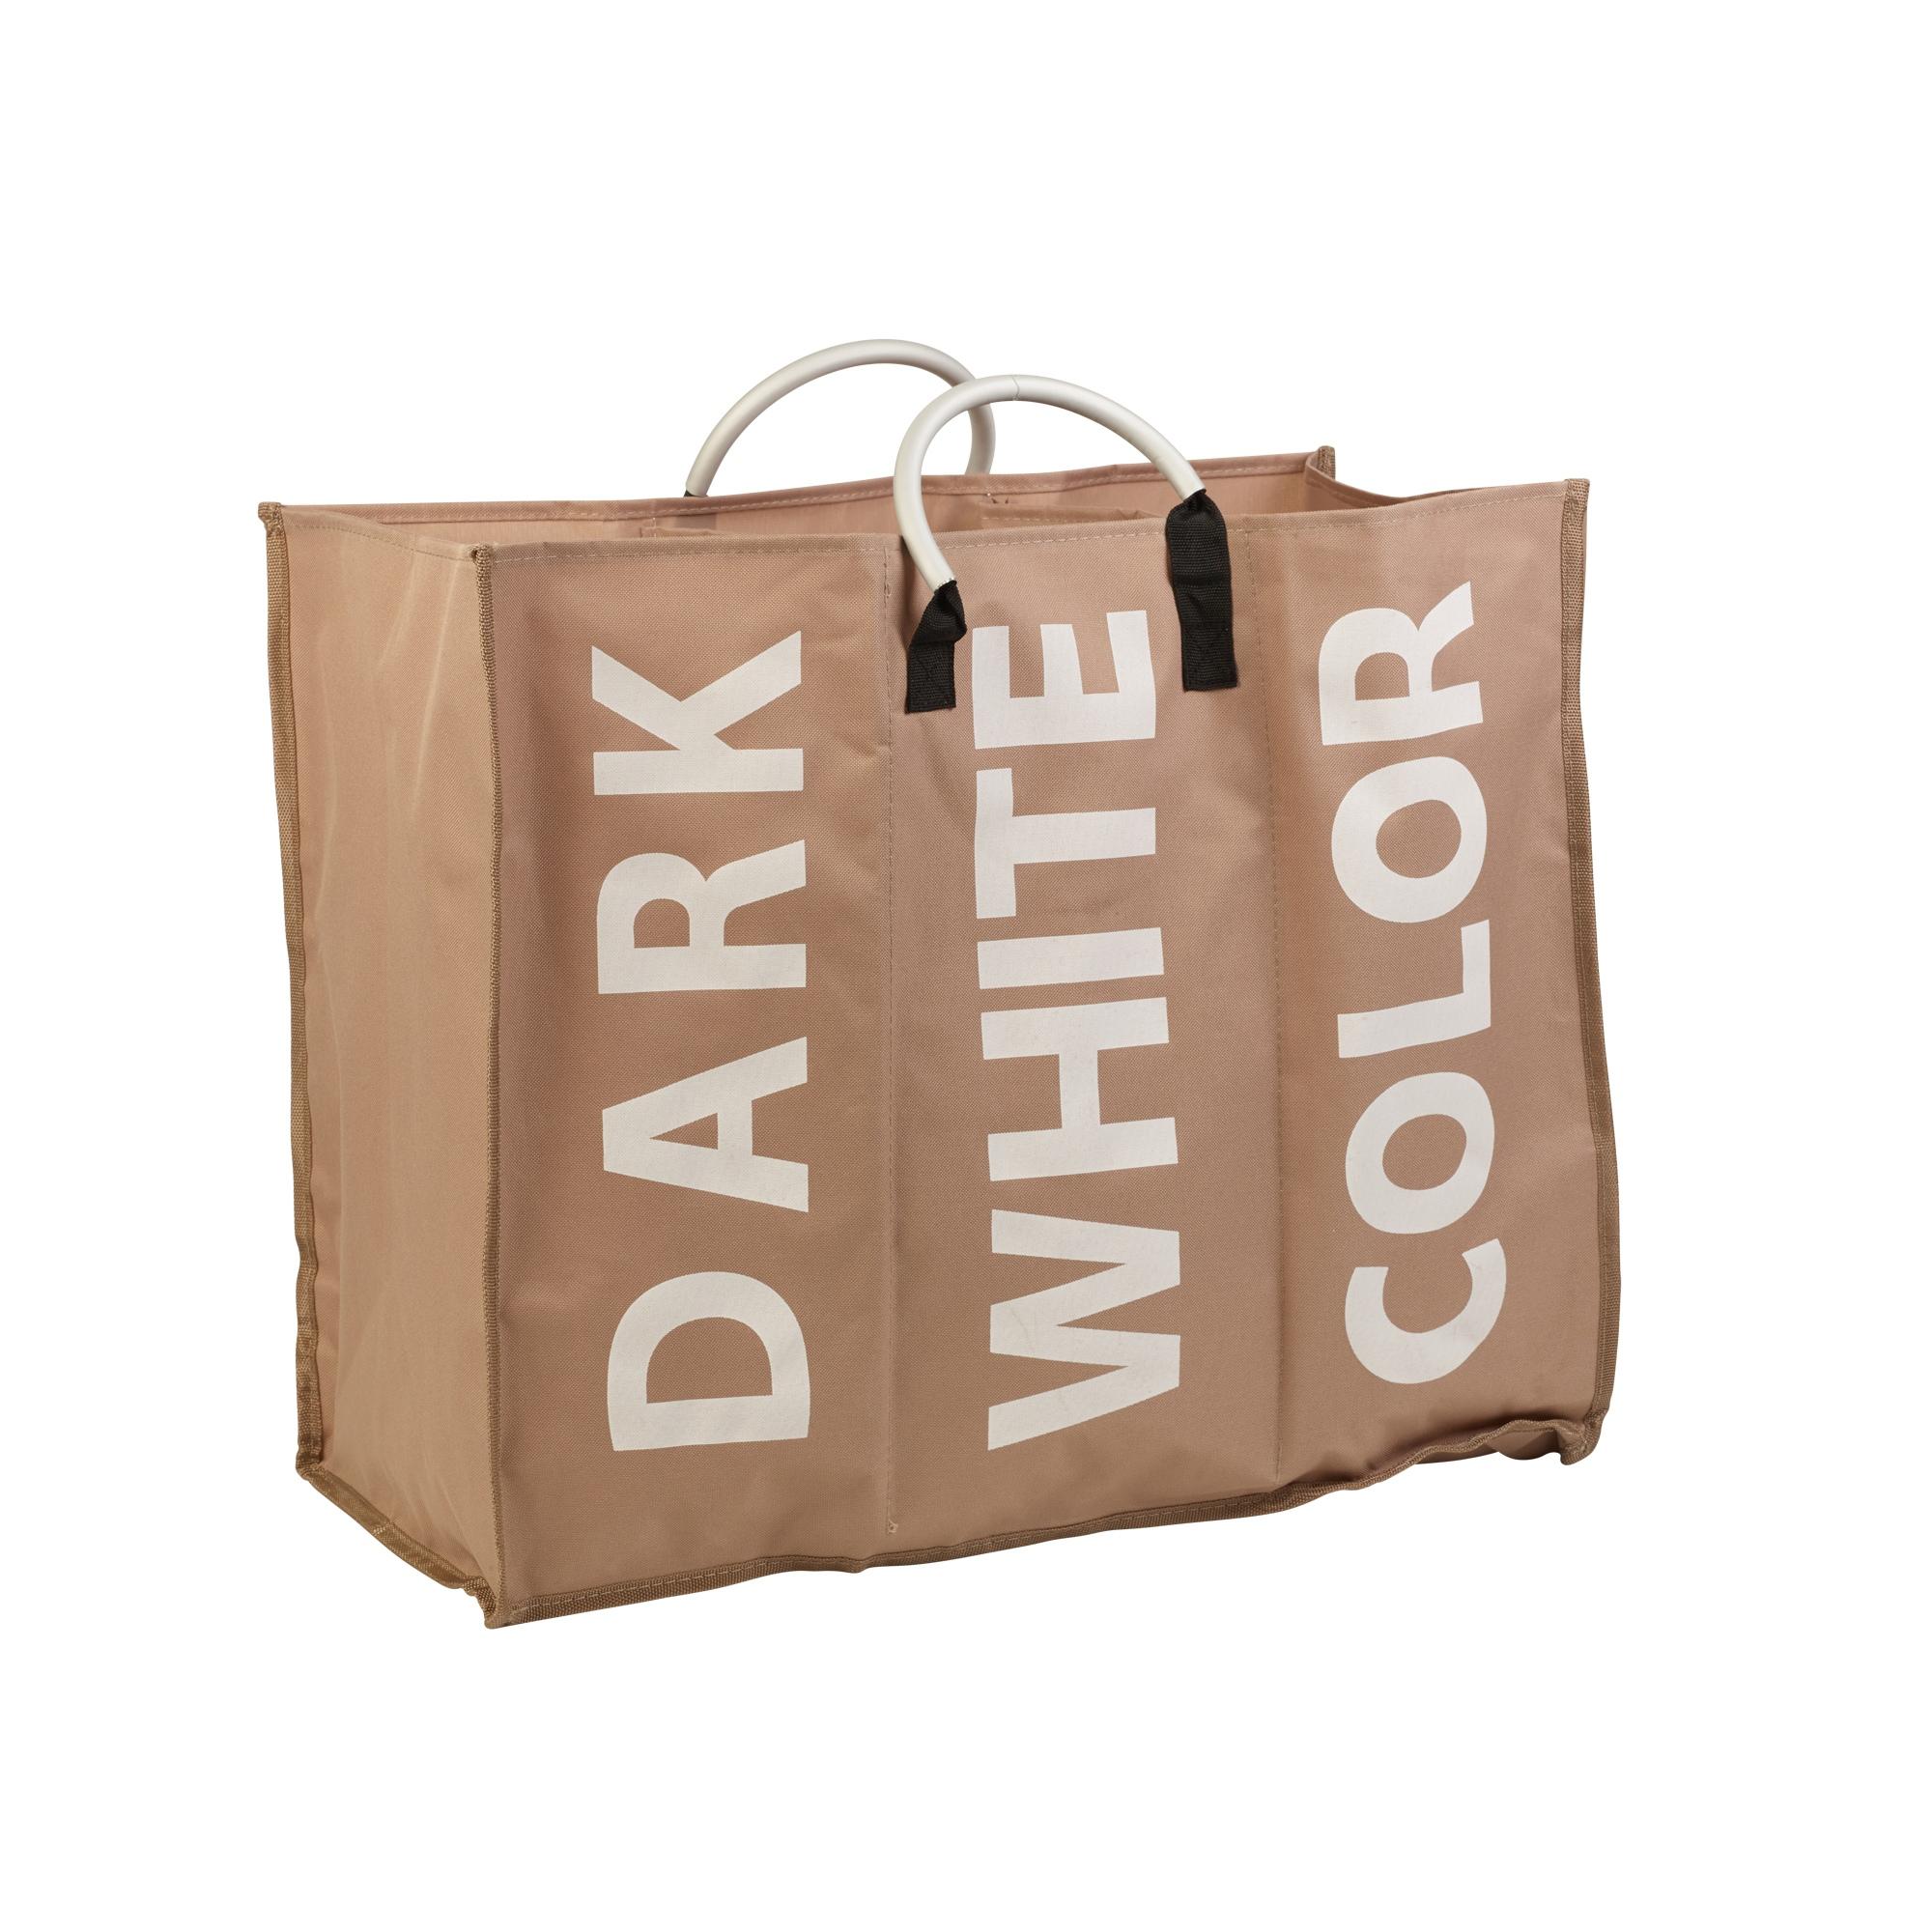 3 Section Laundry Bag Basket Canvas Colour White Dark Storage Washing Hamper Bin Ebay